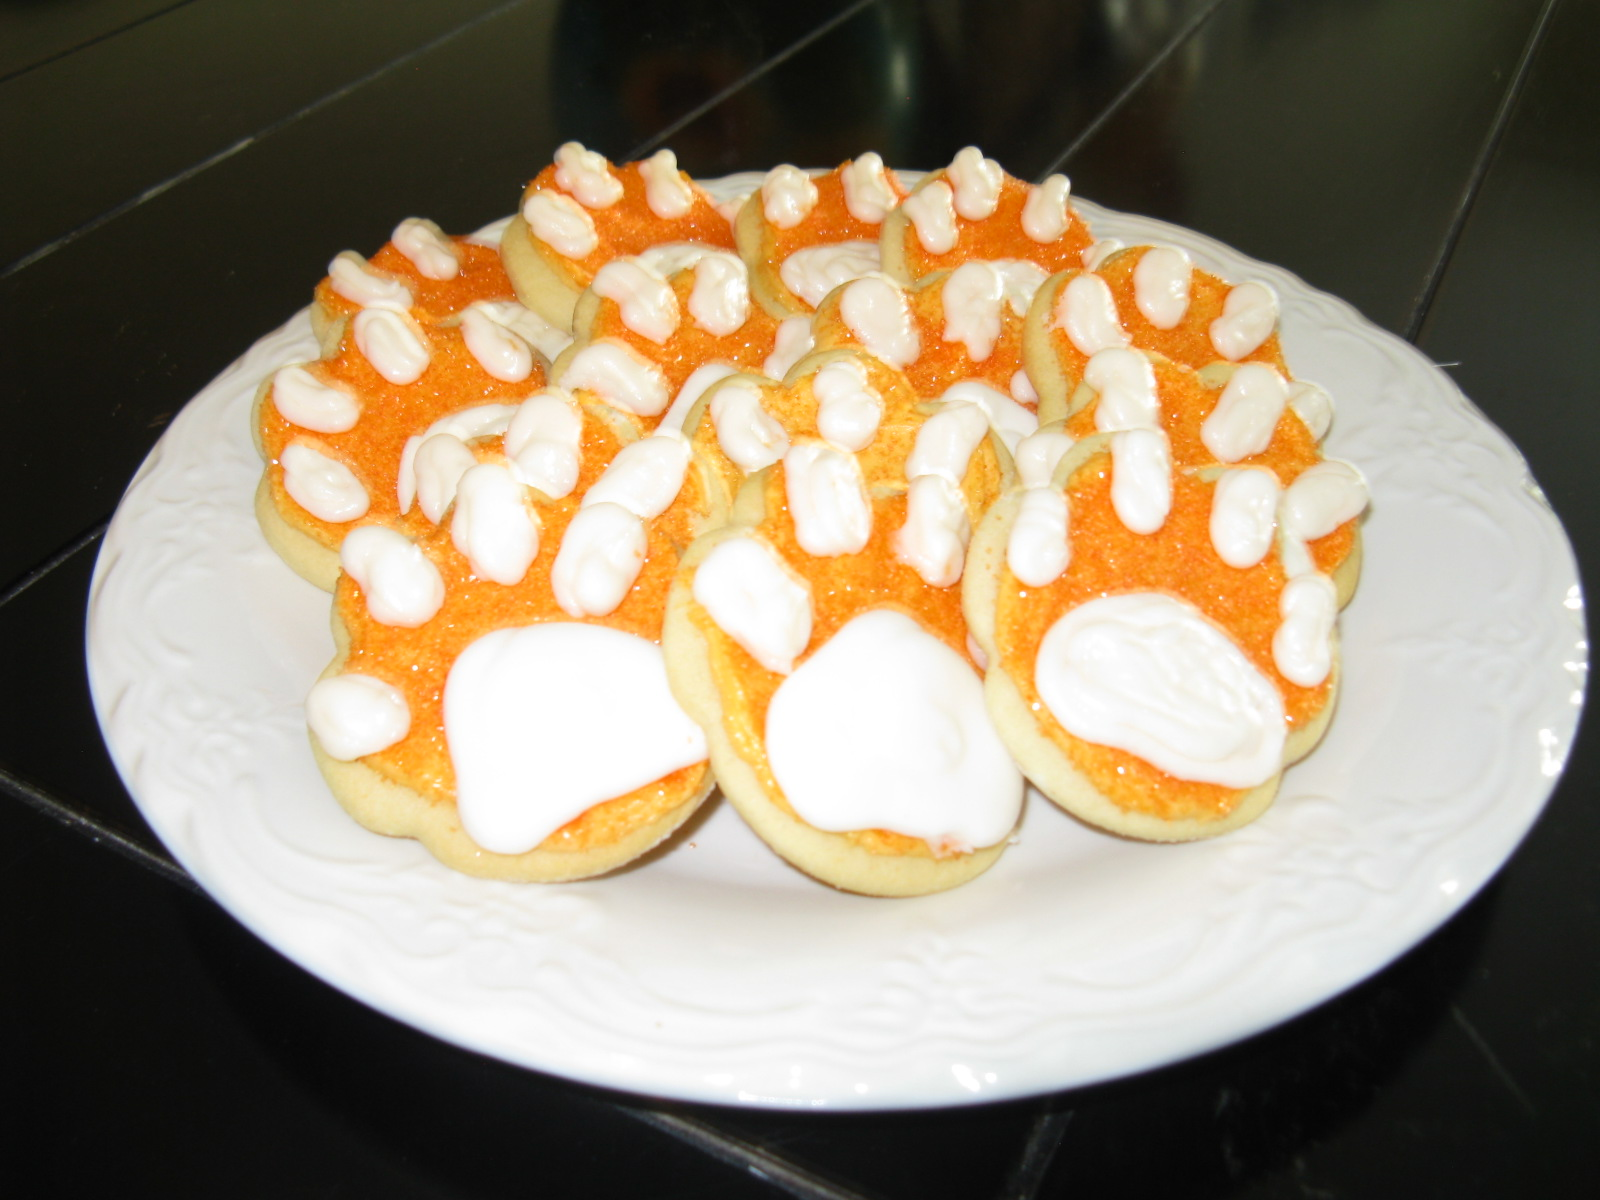 http://2.bp.blogspot.com/_xeAQje83CYo/TKVL5dtVQ5I/AAAAAAAAAEY/4l7HUKeIFsc/s1600/Bakery+Sept+2010+031.JPG